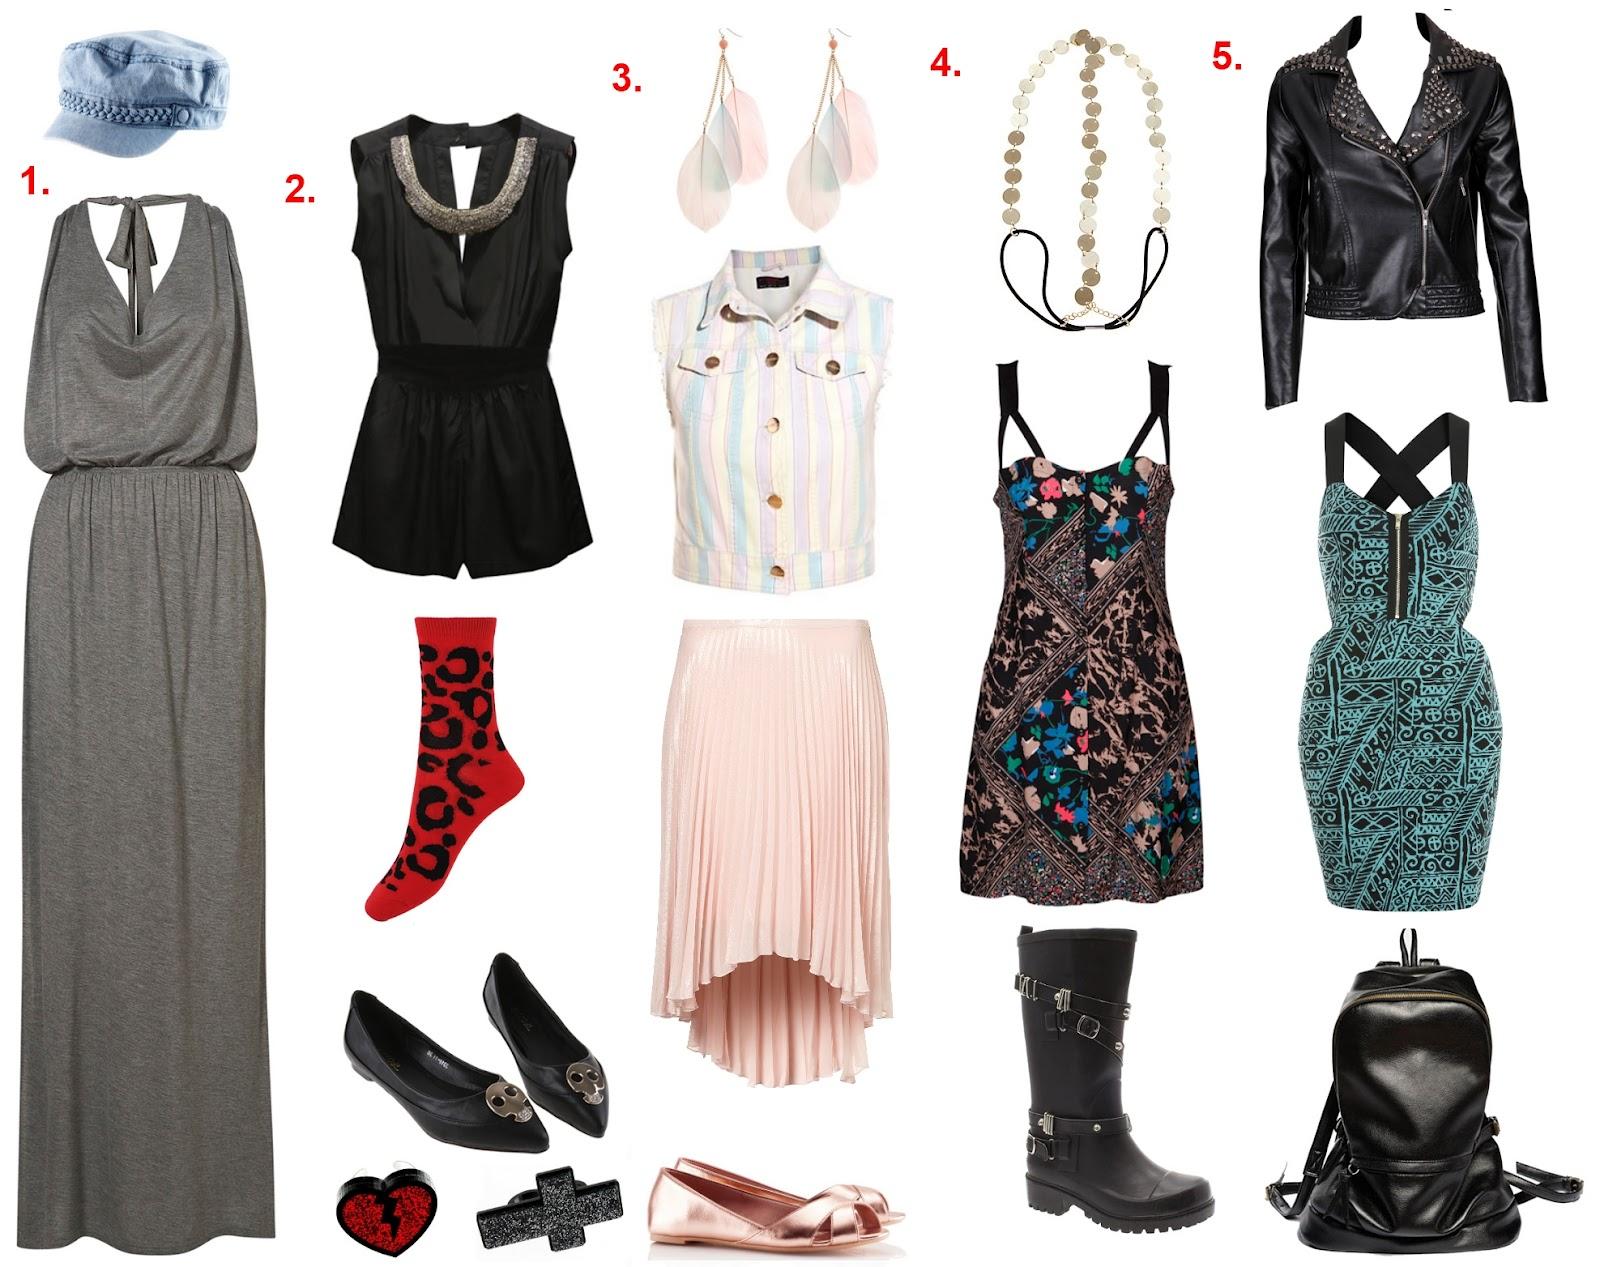 http://4.bp.blogspot.com/-_H1aYstSe18/T5Wj_r0vuiI/AAAAAAAAAPQ/32G6a9LwXds/s1600/Festival+Fashion+Trend.jpg